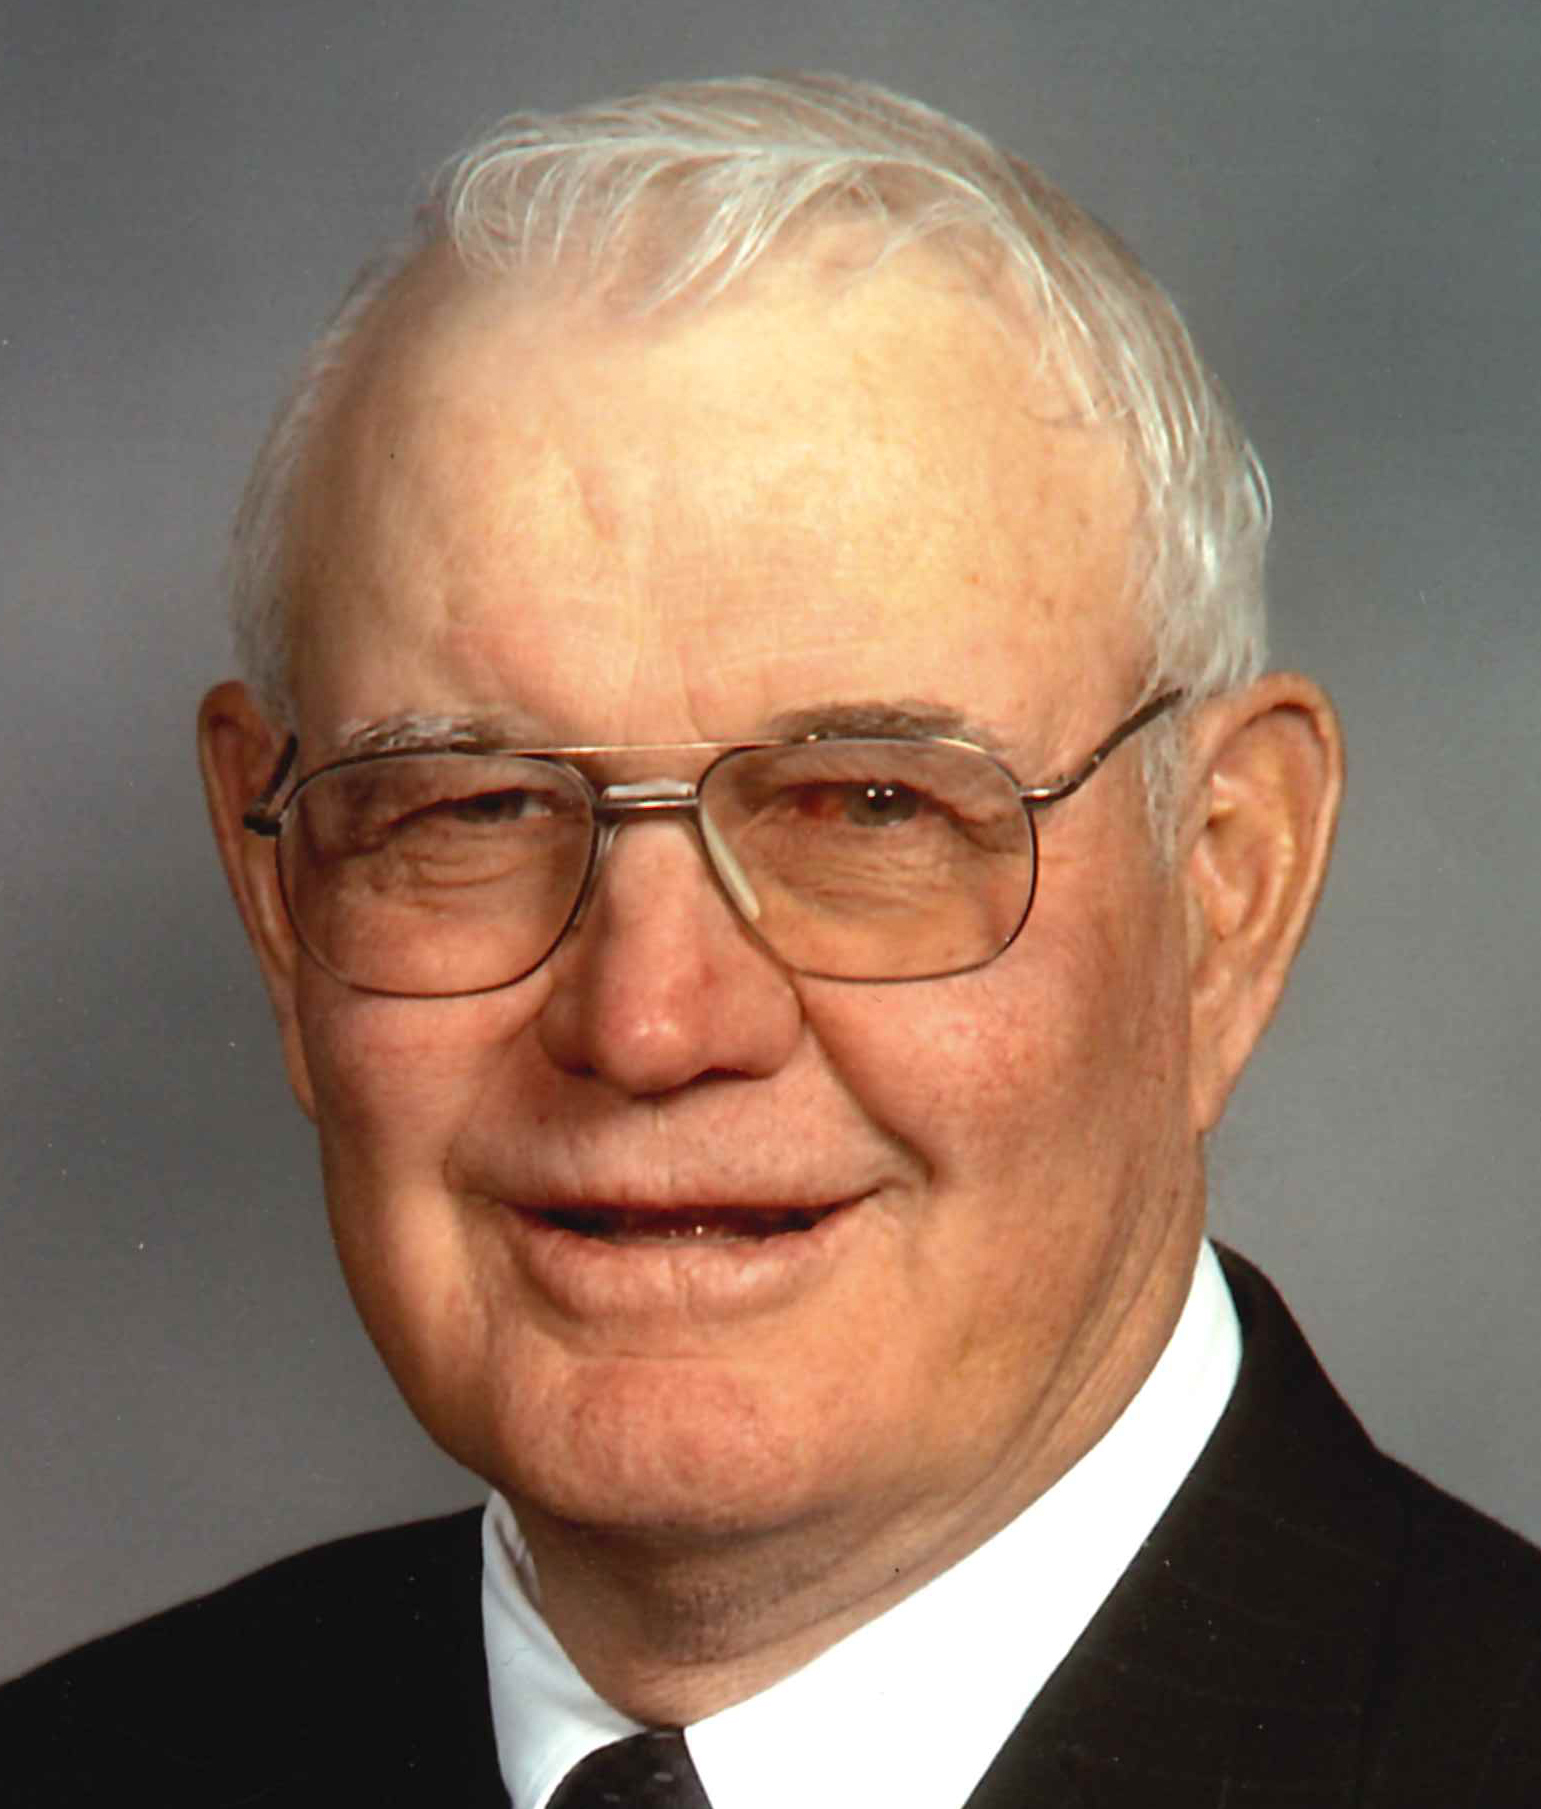 Gary Gearo Peterson, 84 years of age, of rural Bertrand